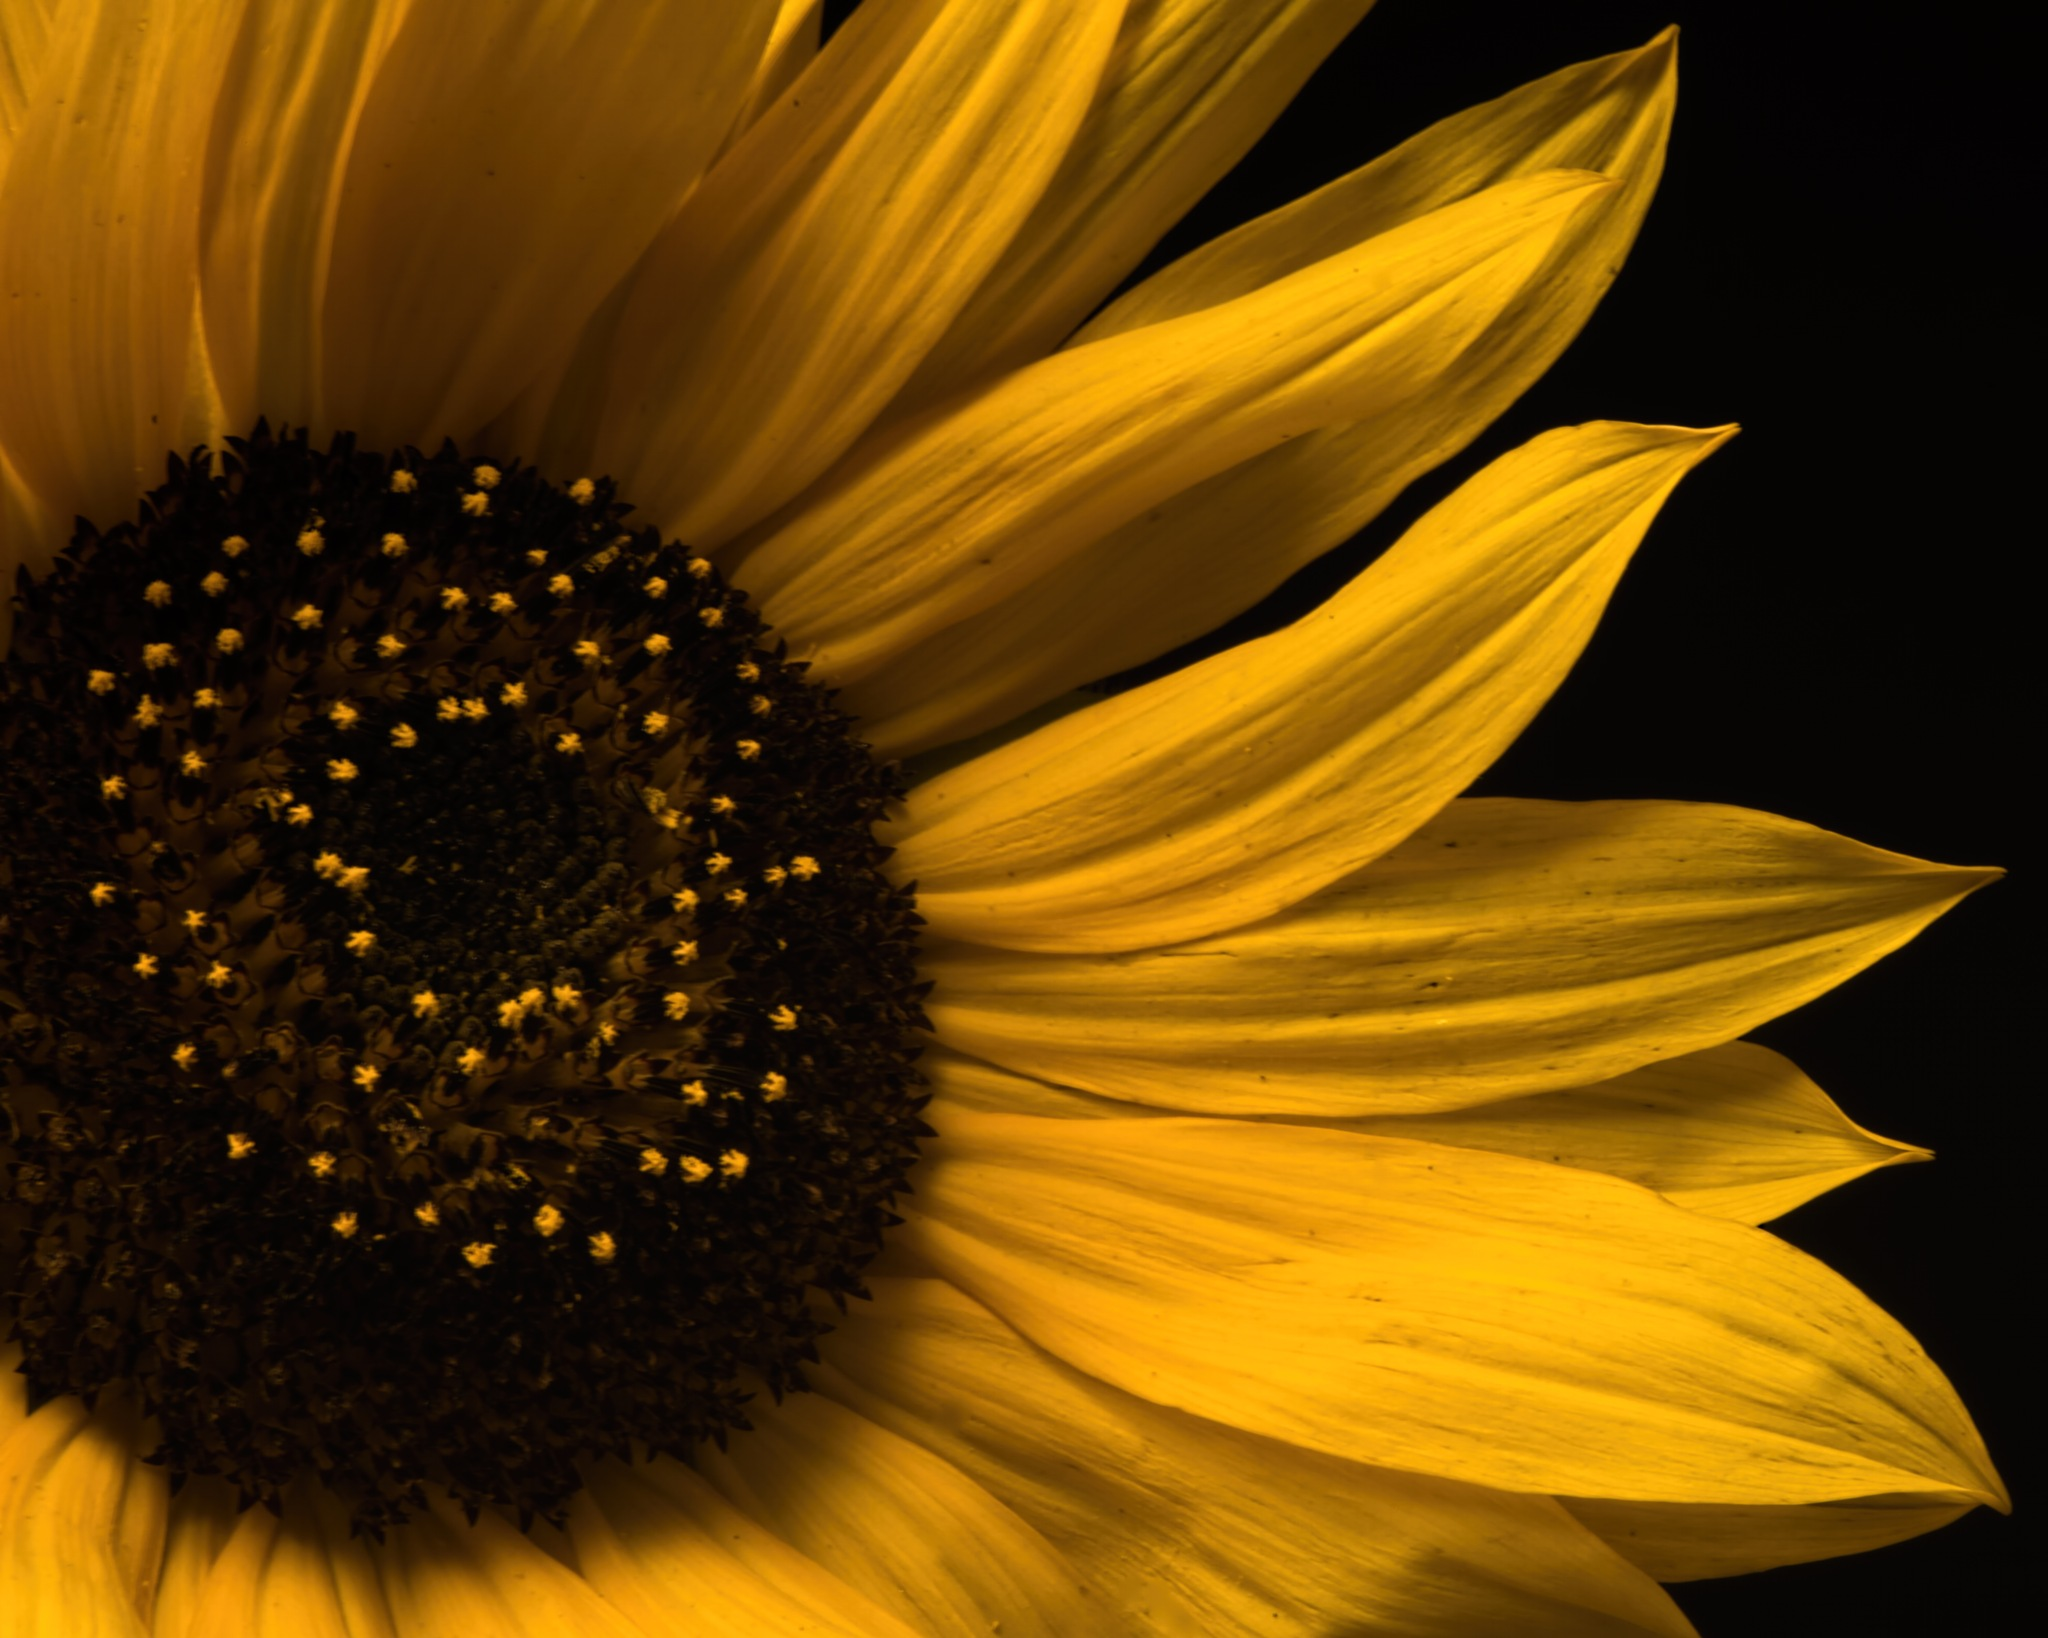 Yellow Sunflower Detail 0802 by ThomasJerger